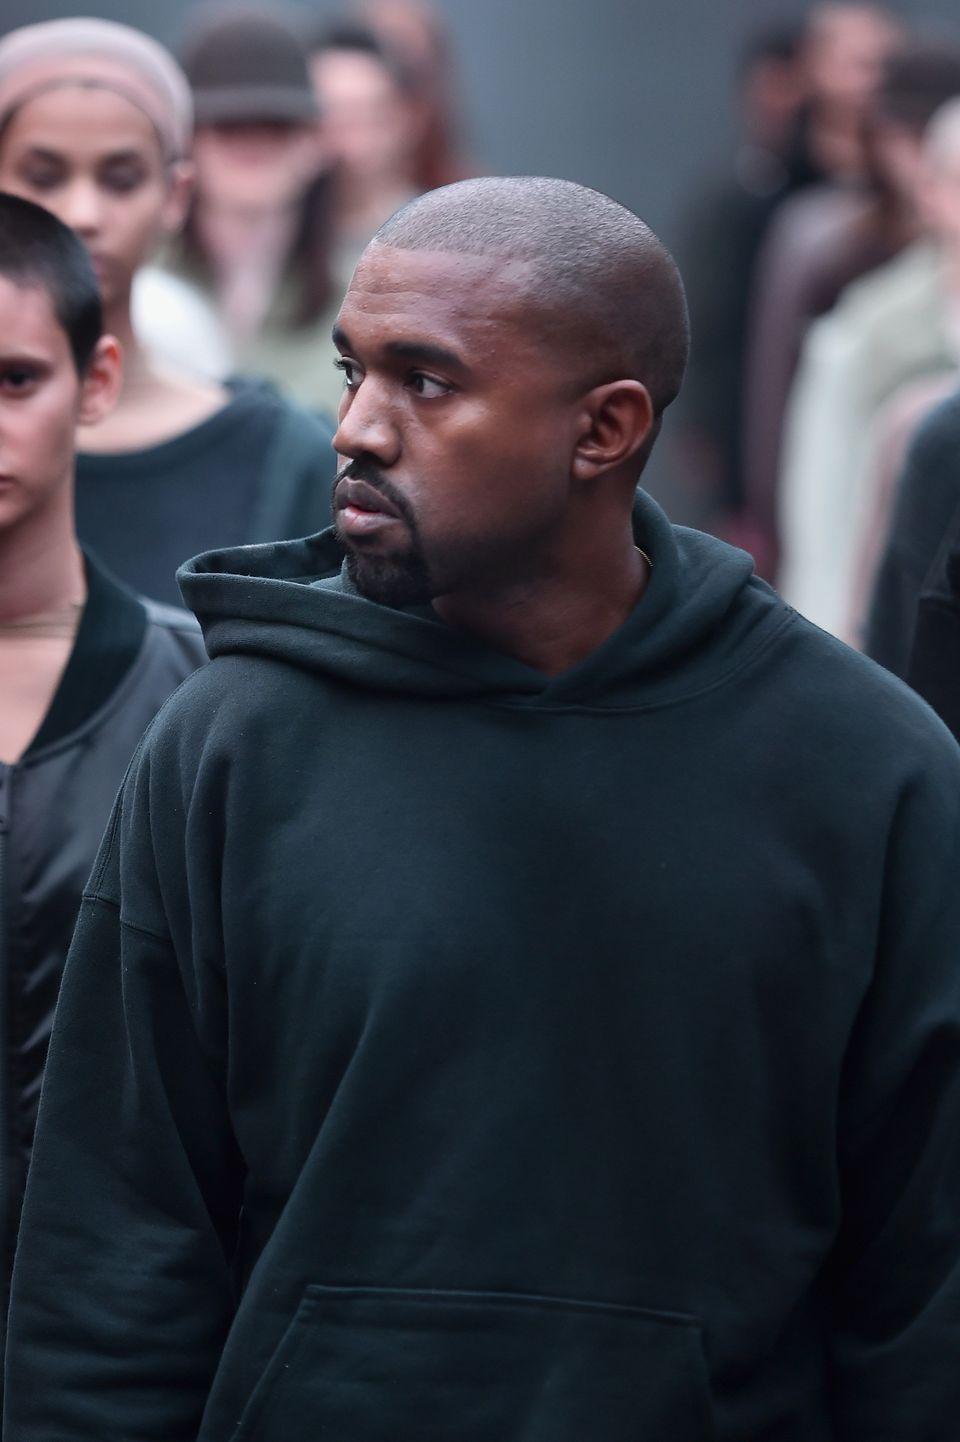 NEW YORK, NY - FEBRUARY 12:  Kanye West on the runway at the adidas Originals x Kanye West YEEZY SEASON 1 fashion show during